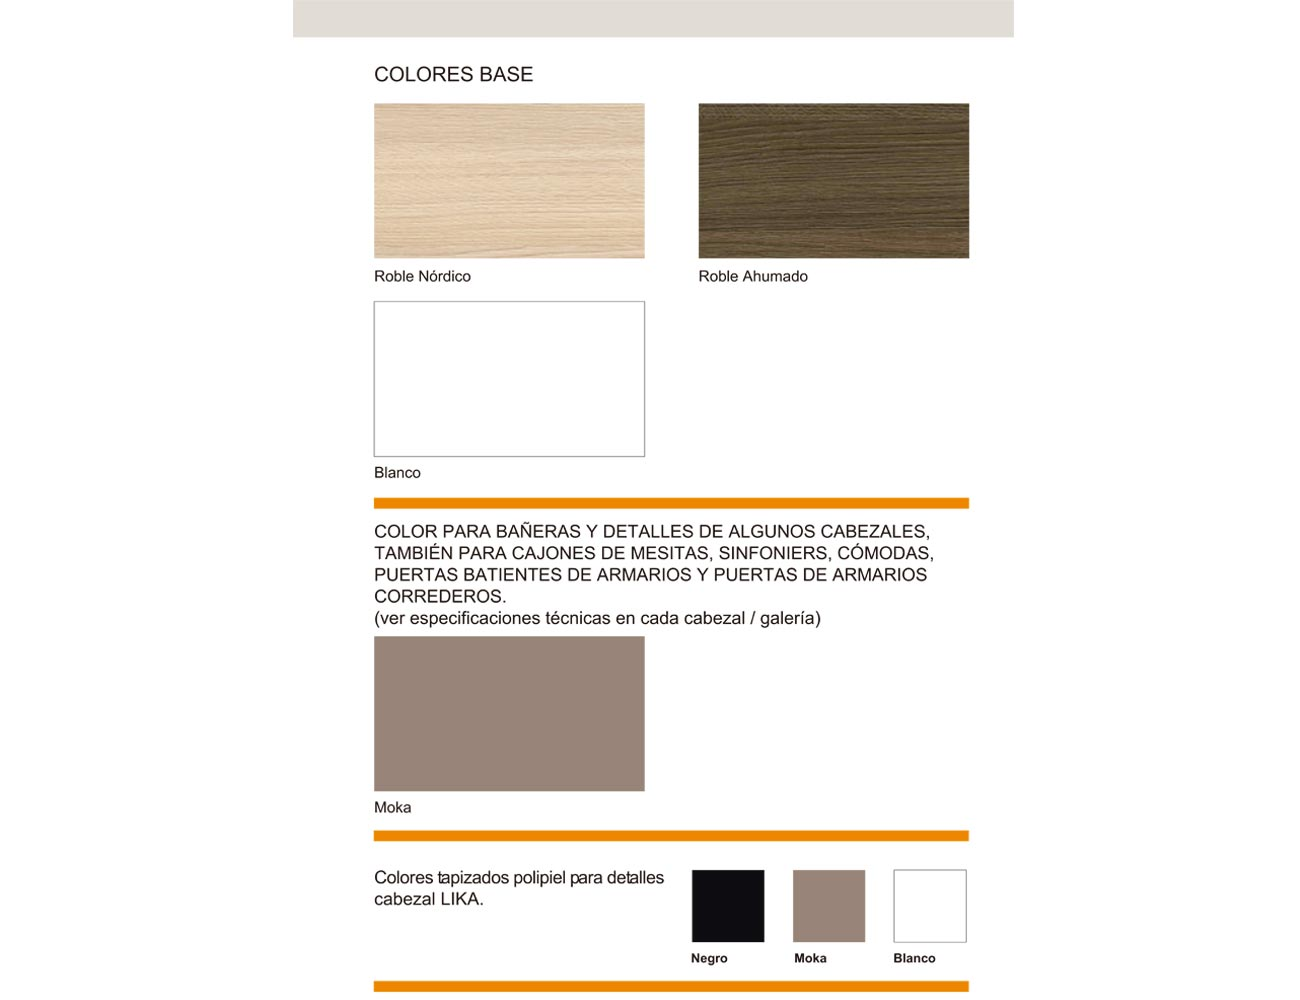 Colores251